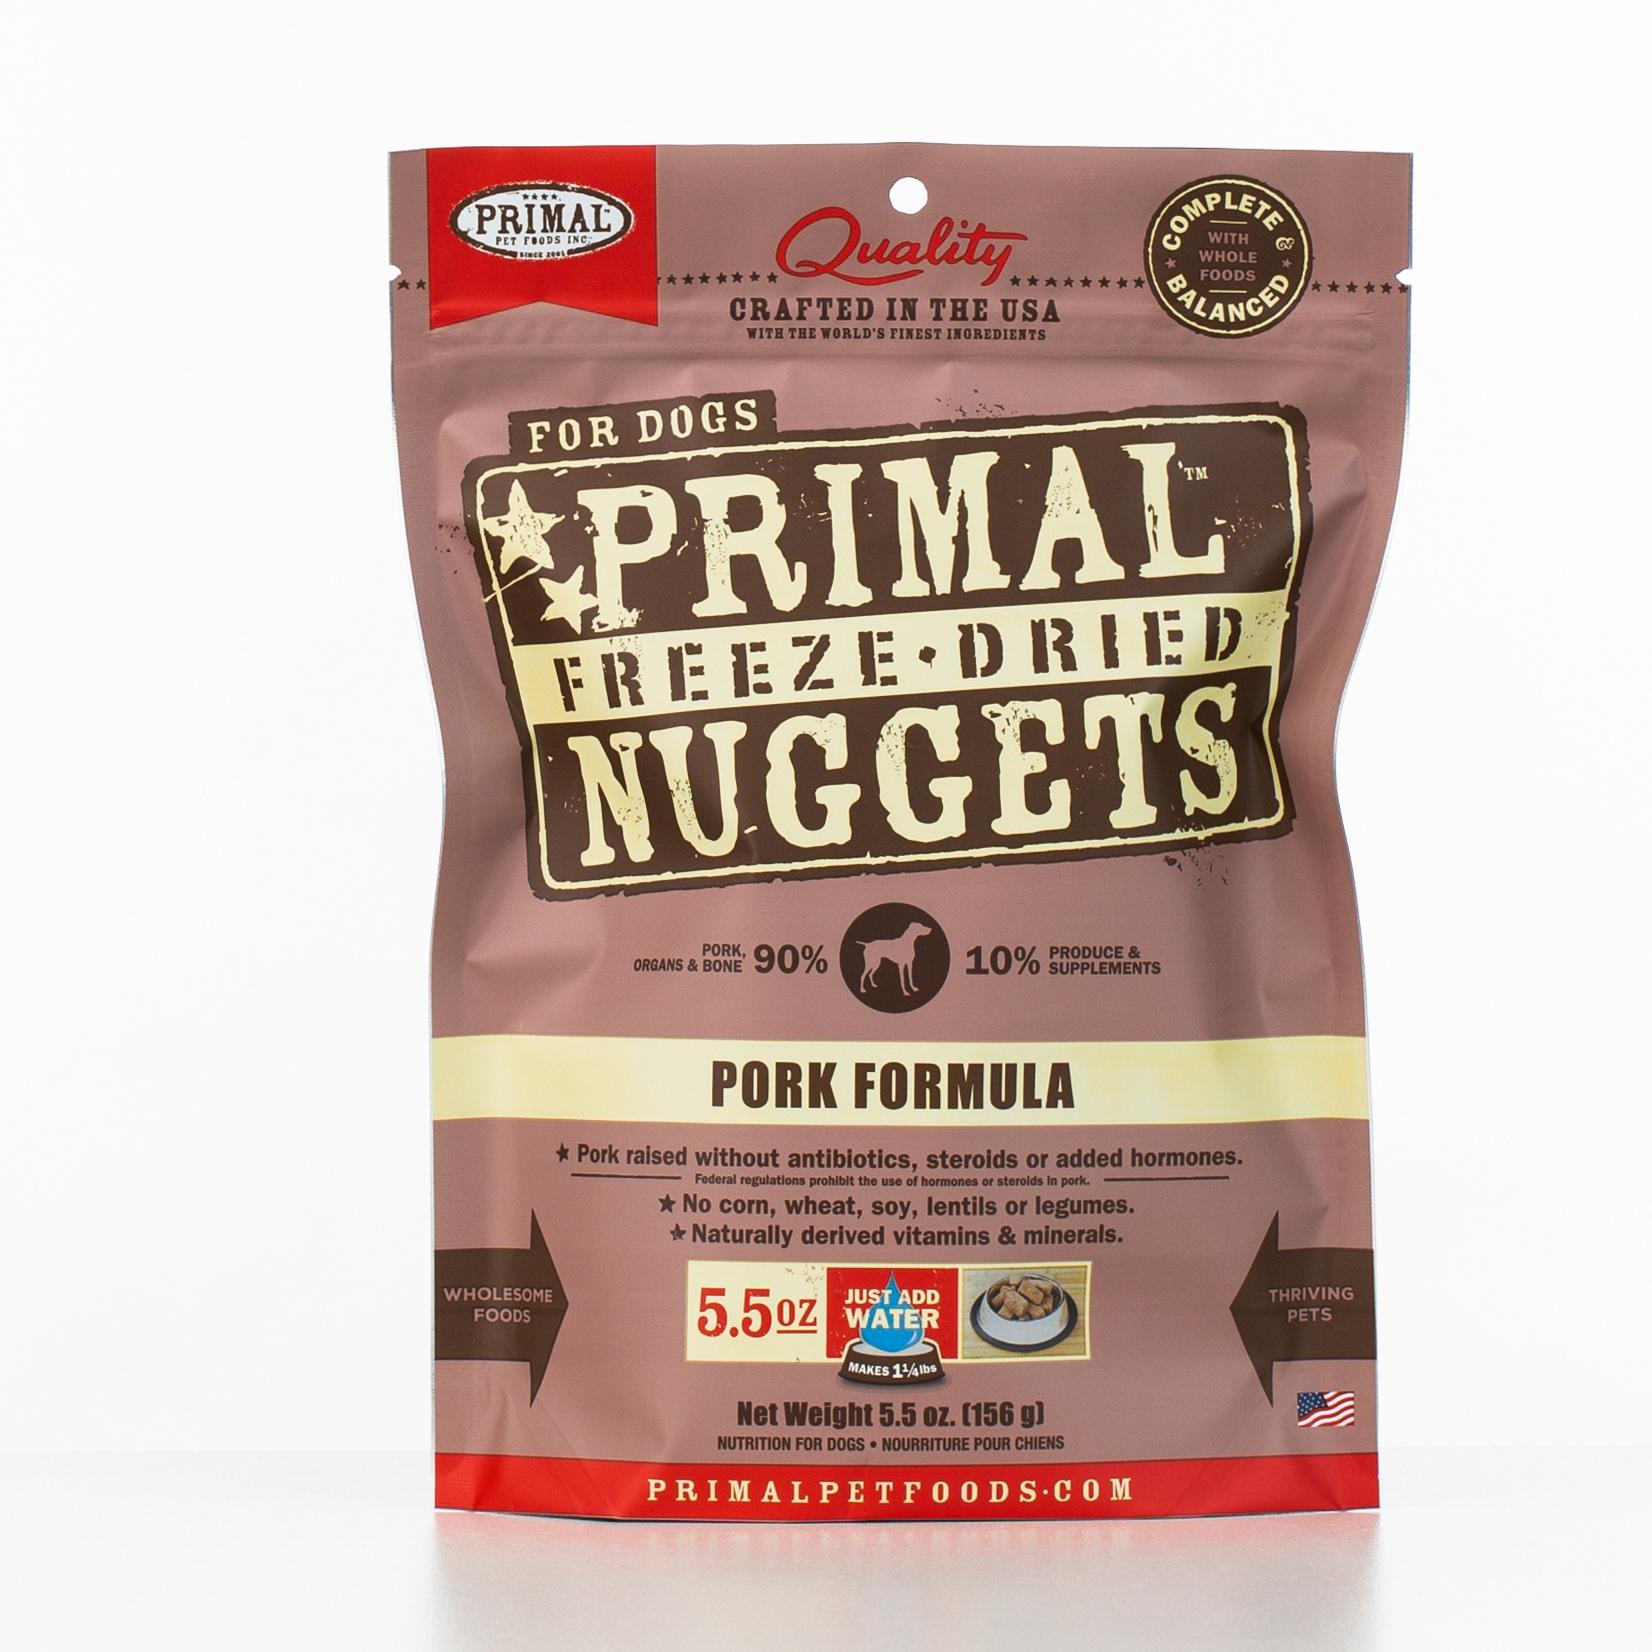 Primal Raw Freeze-Dried Nuggets Pork Formula Dog Food Image